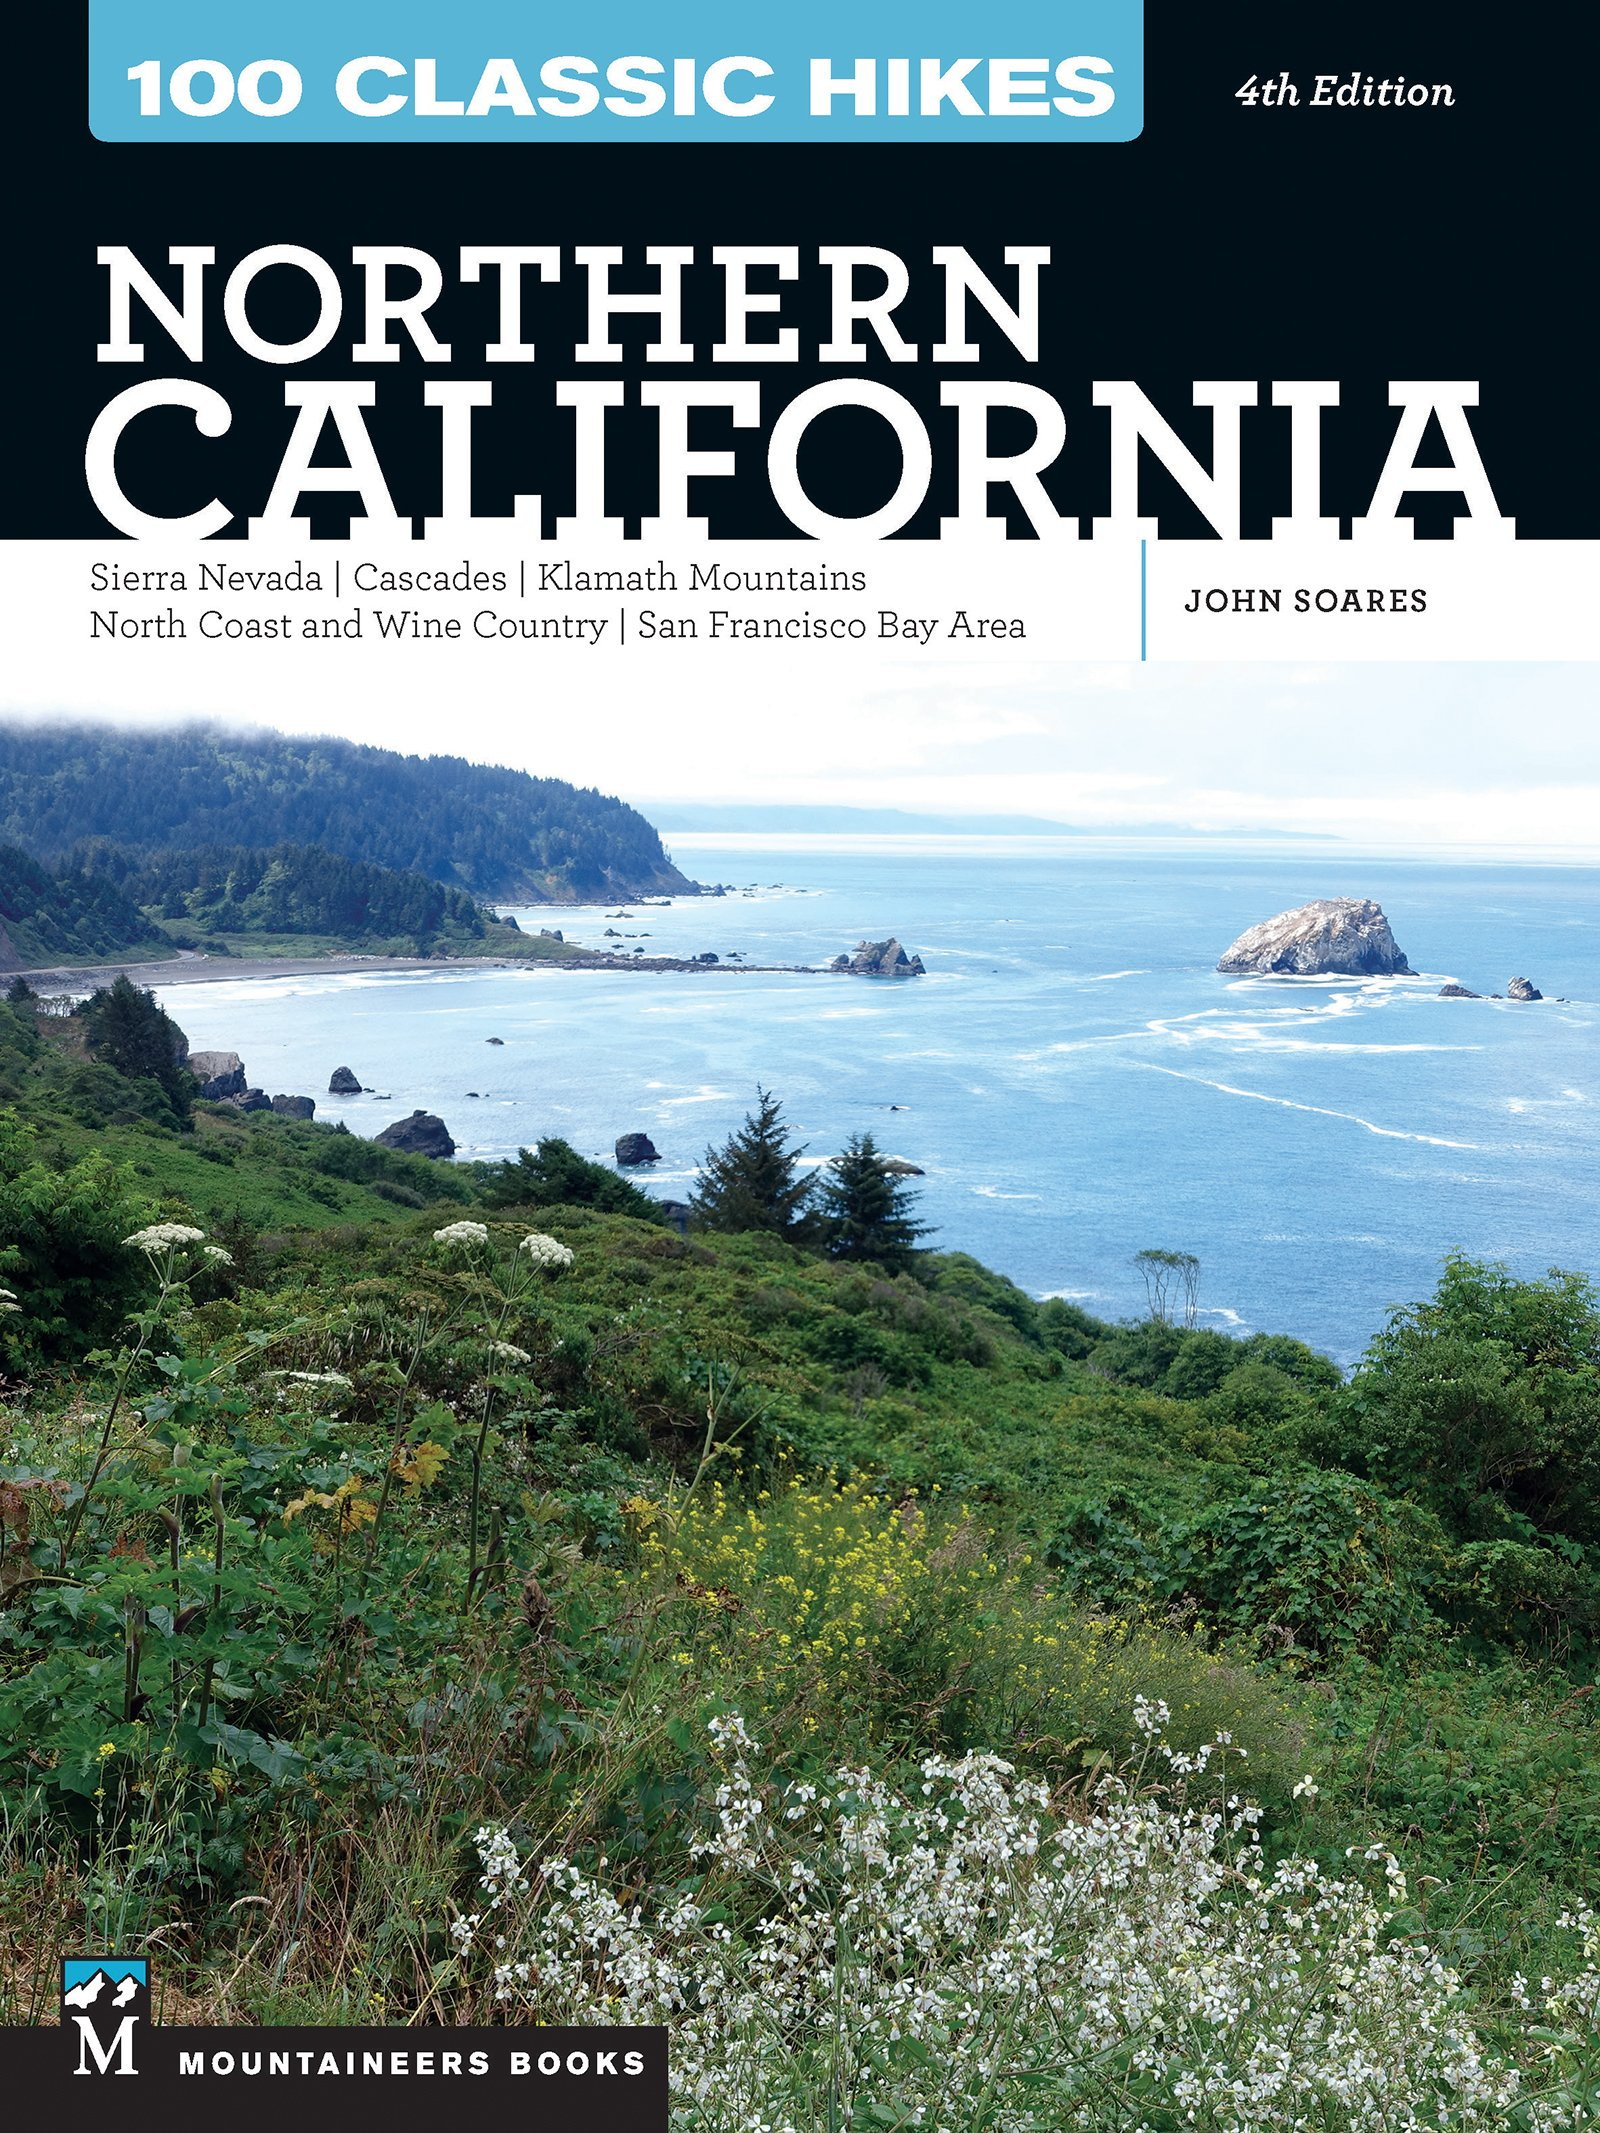 100 Classic Hikes: Northern California: Sierra Nevada, Cascades, Klamath Mountains, North Coast and Wine Country, San Francisco Bay Area